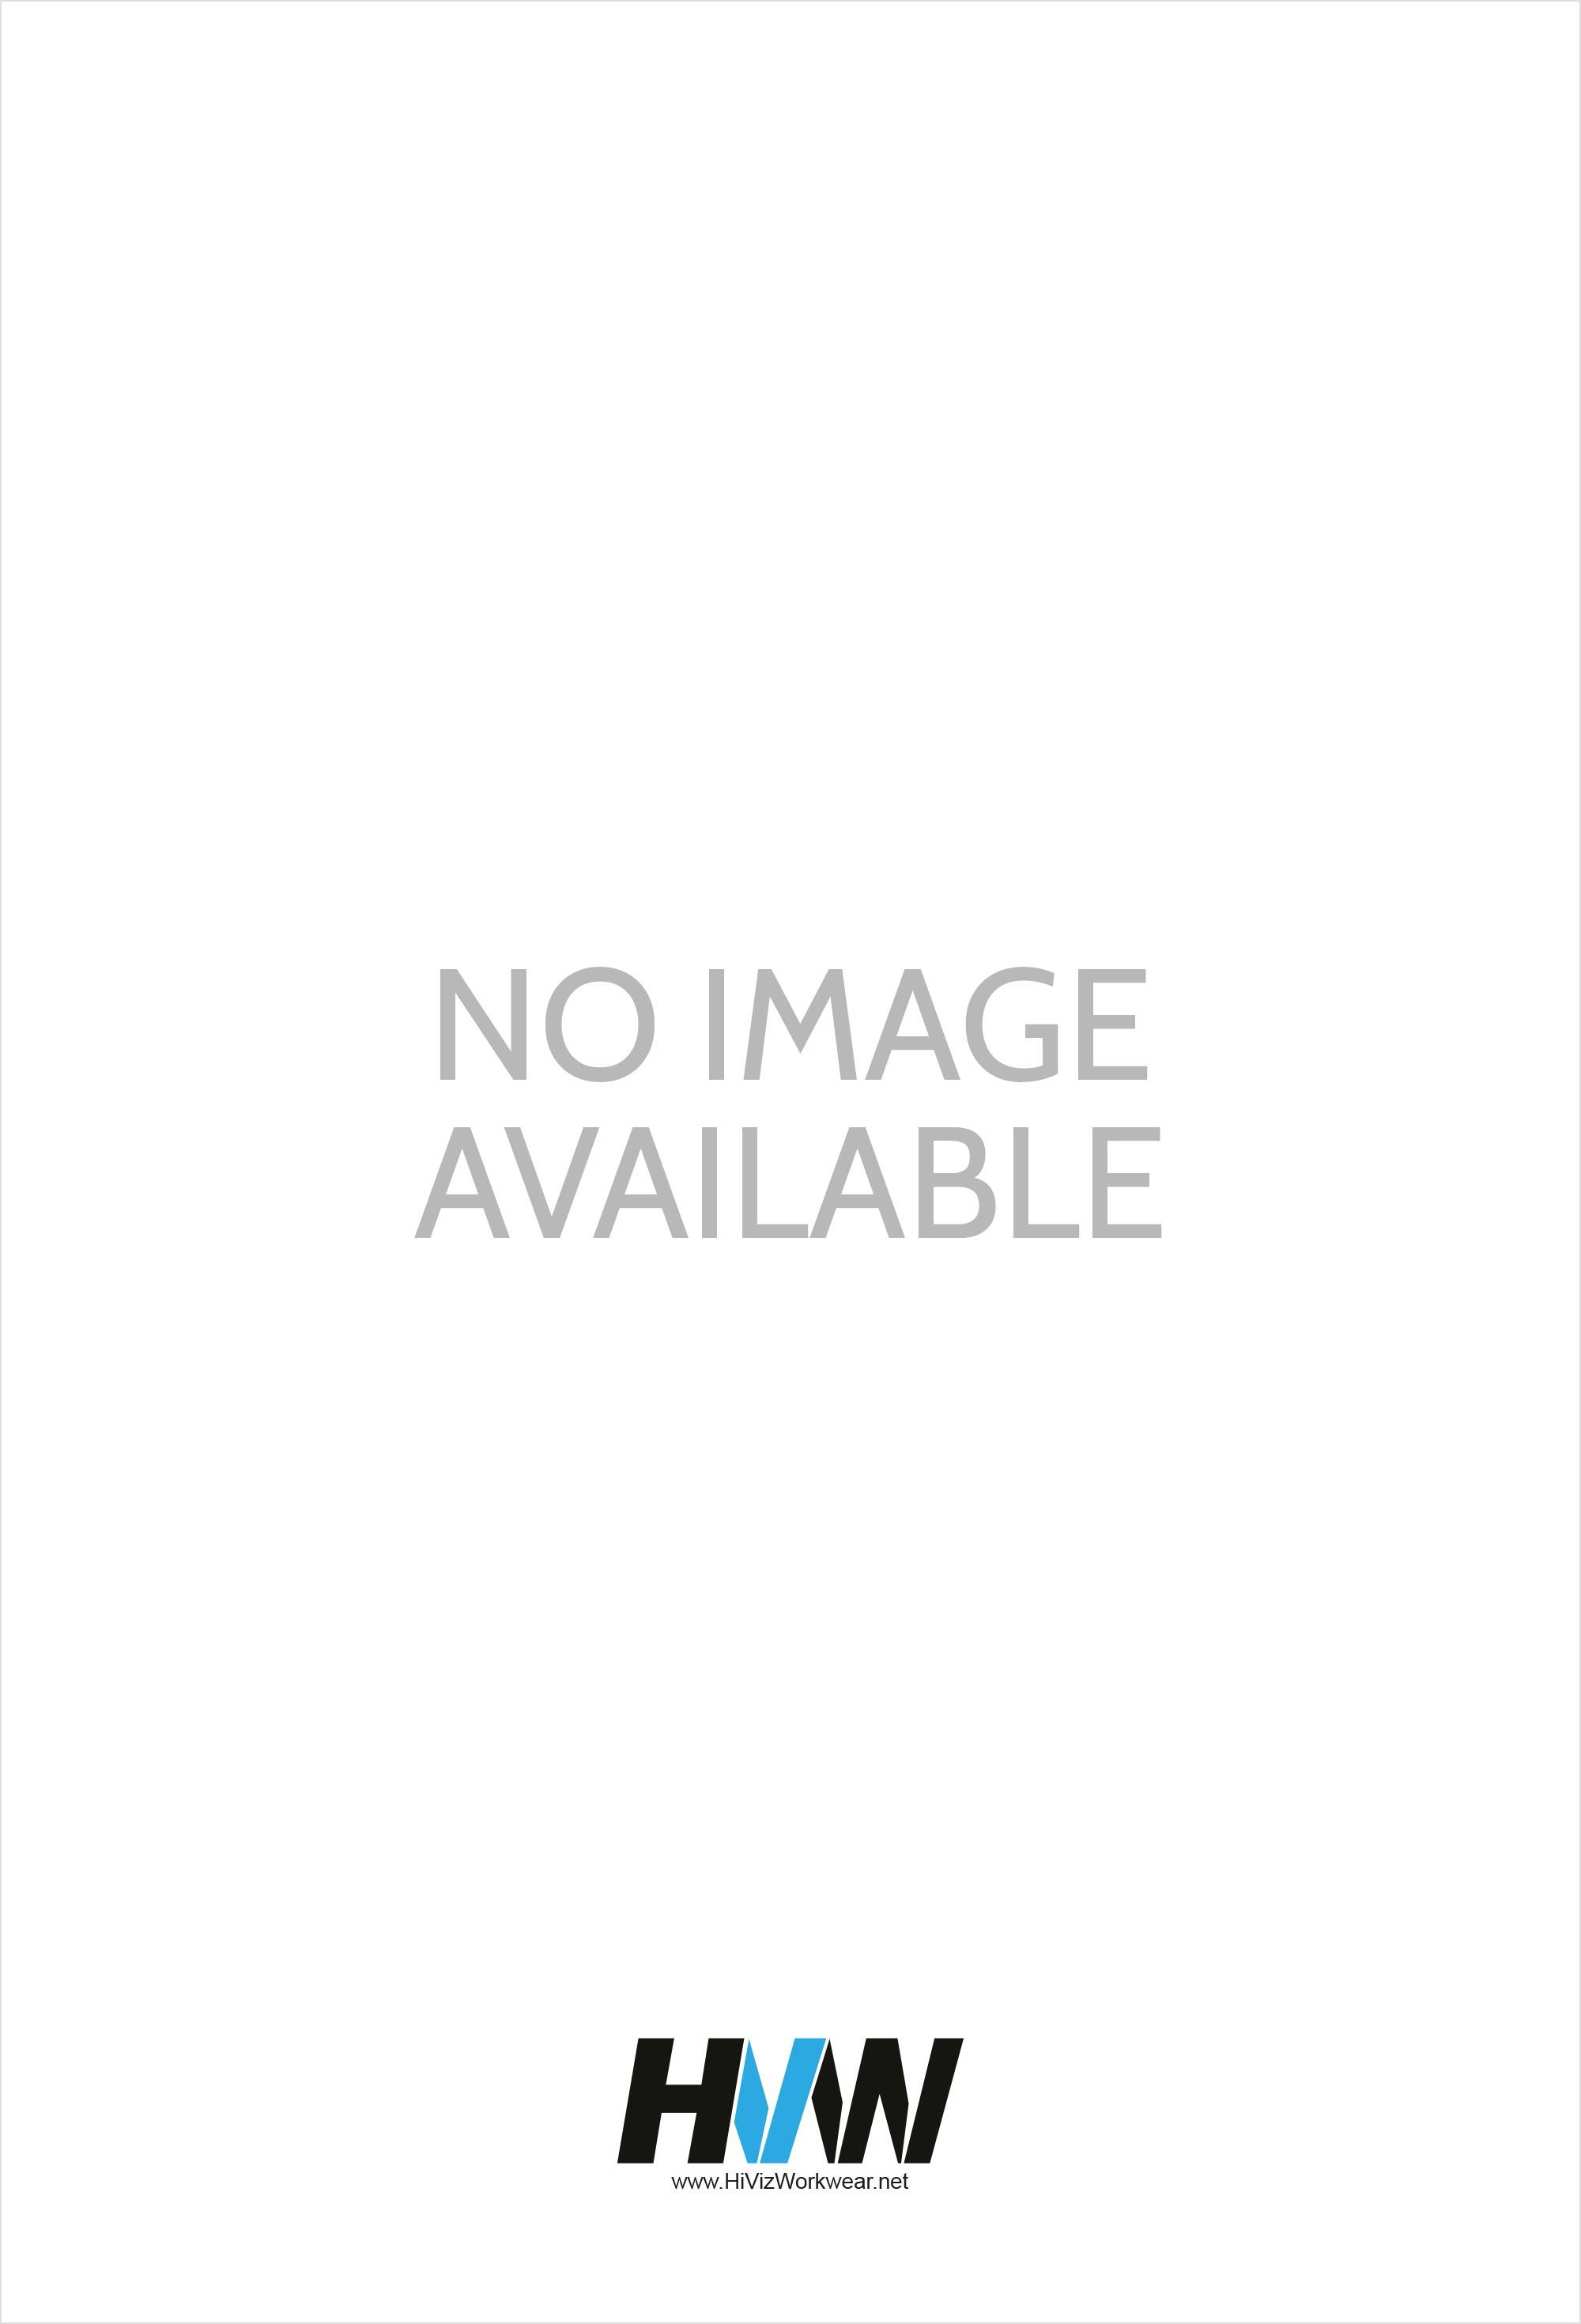 J266M Authentic Zipped Hooded Sweatshirt